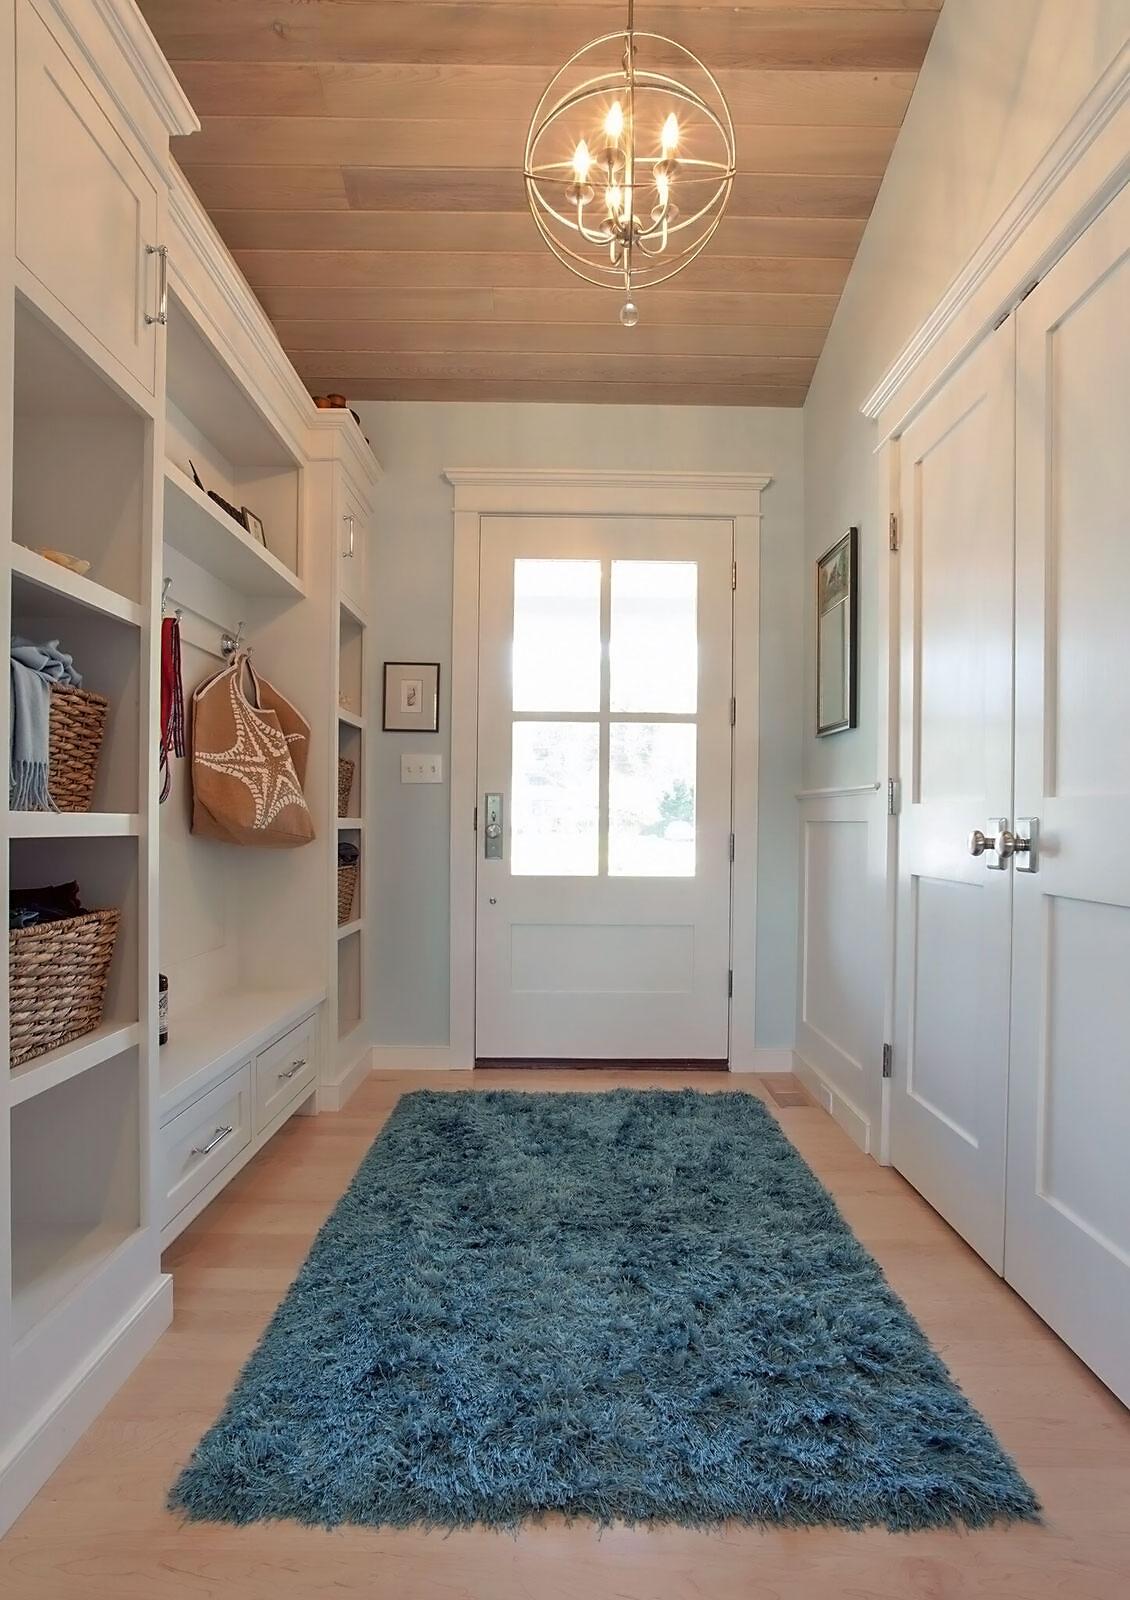 Stephen-Sullivan-Inc-Custom-Home-Builders-Rhode-Island-Narrow-River-Cottage---1